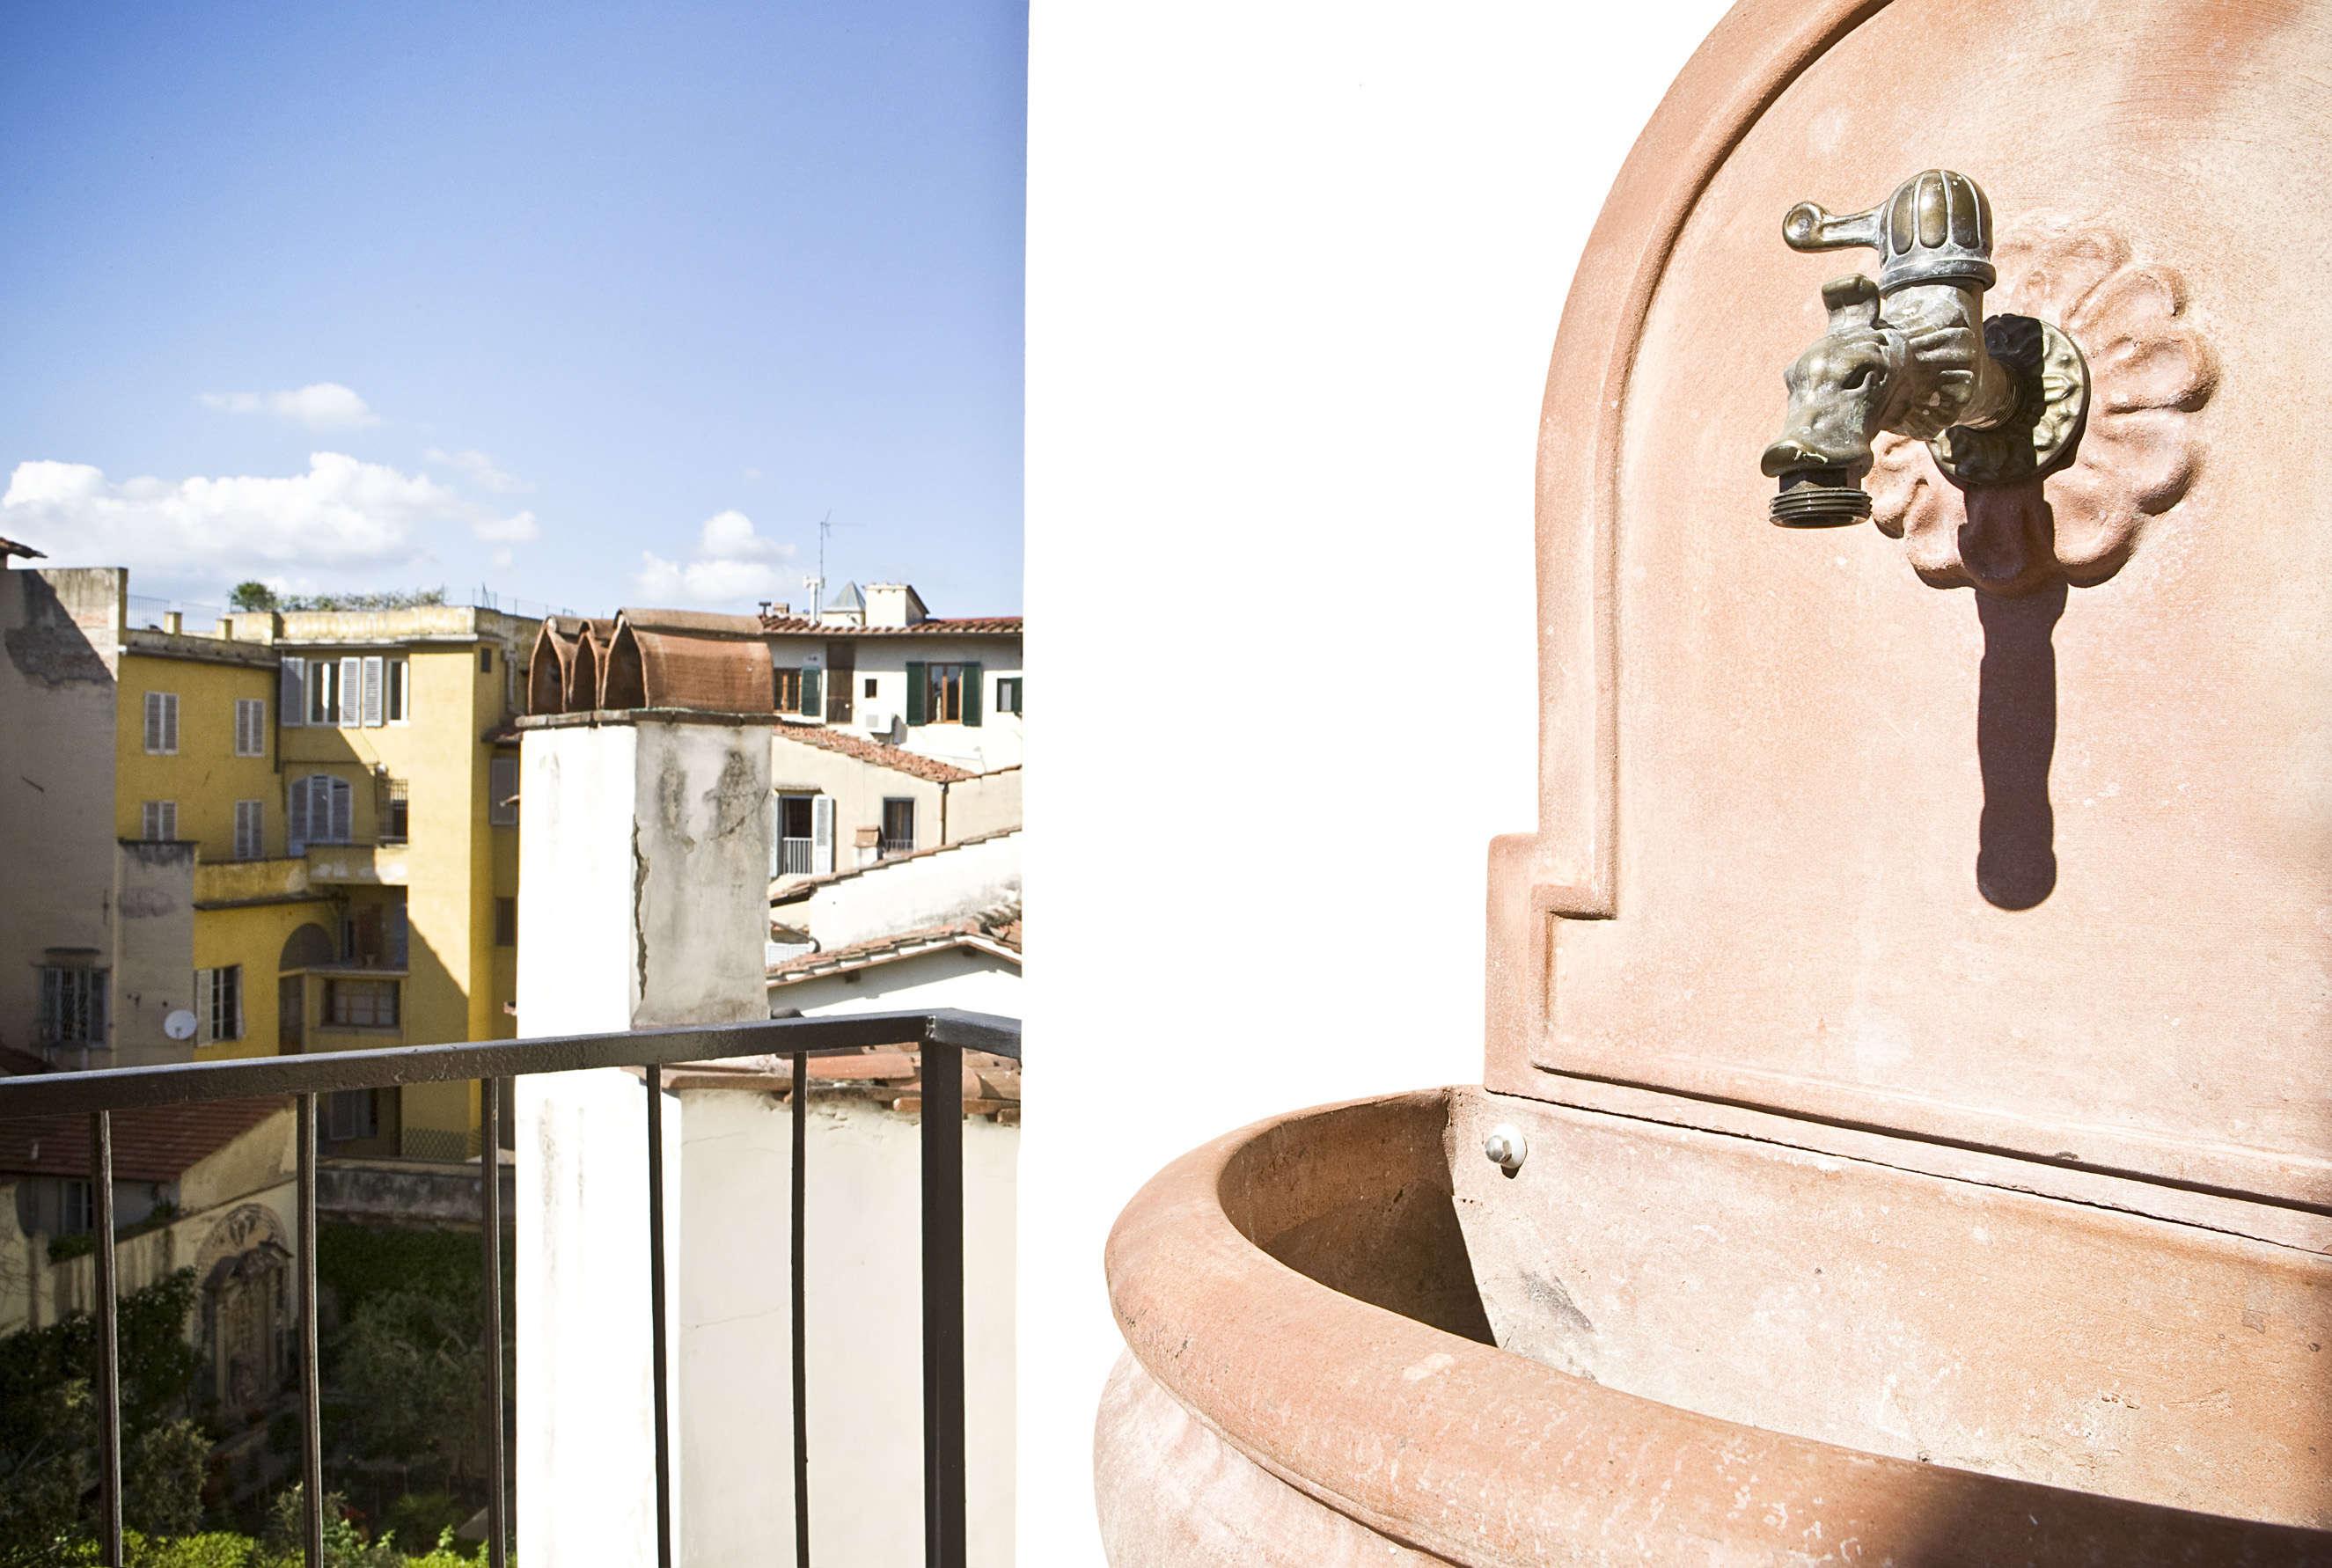 Washbasin in Balcony